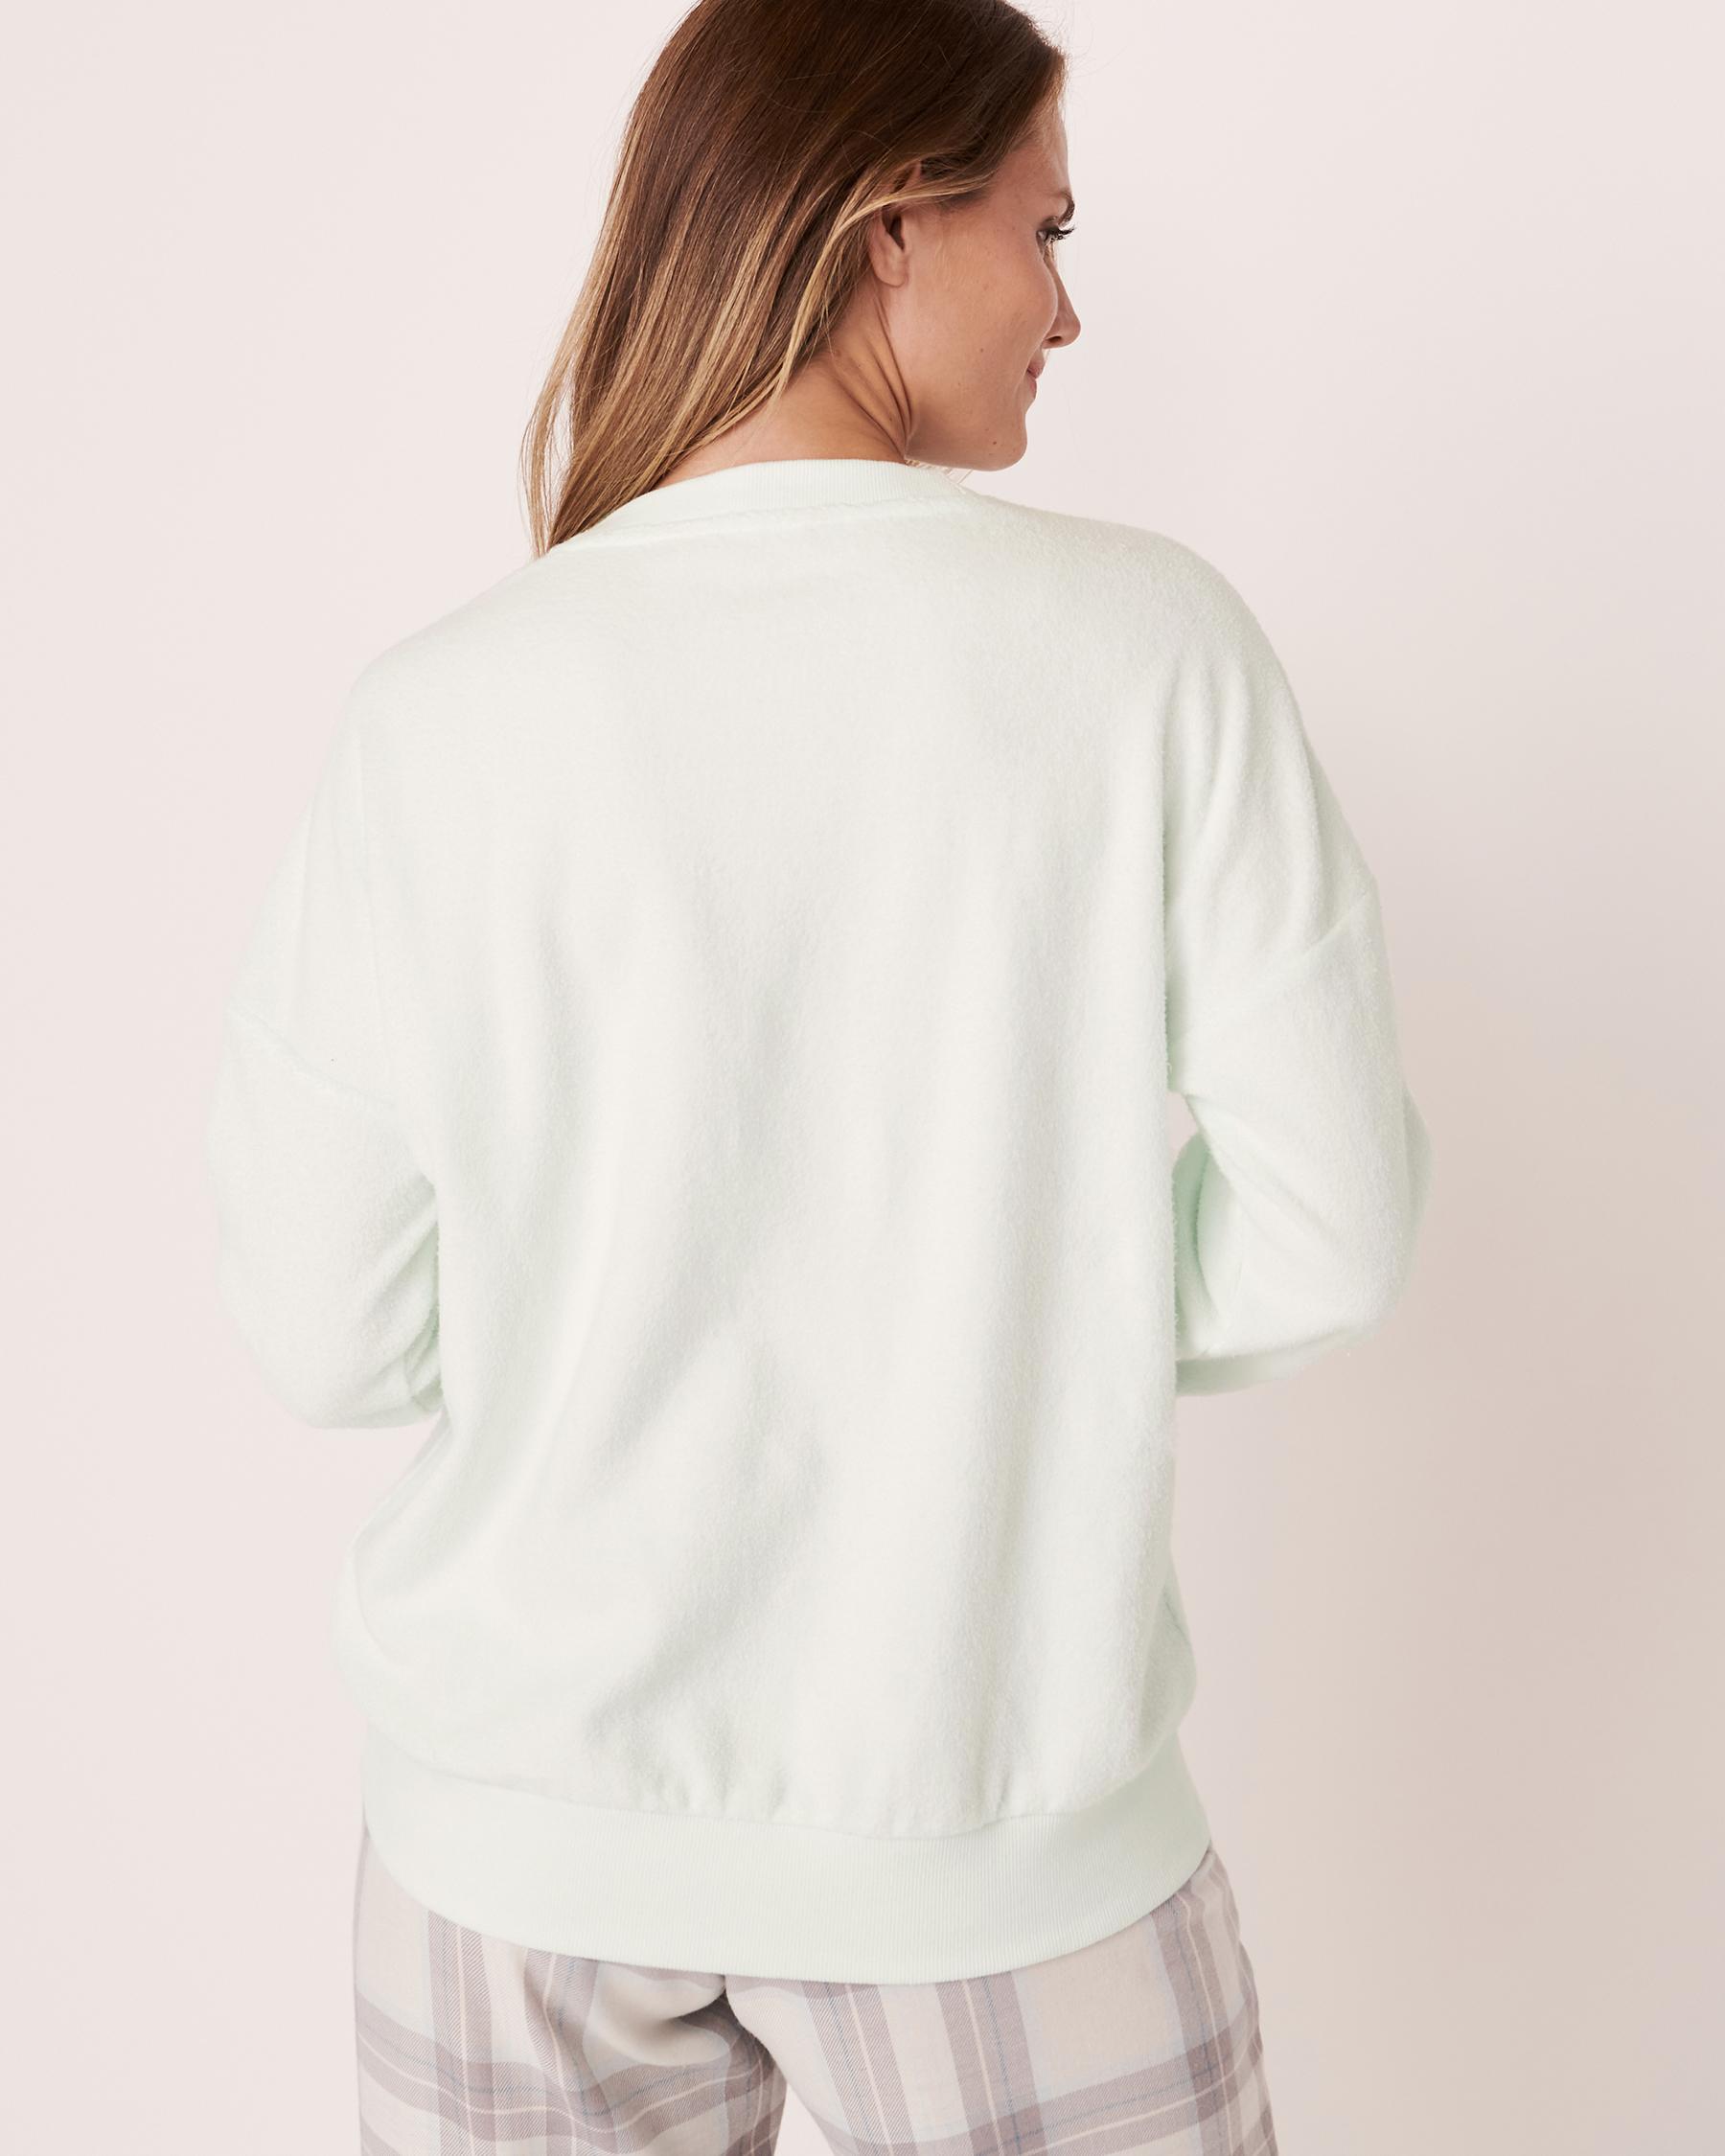 LA VIE EN ROSE Mini Sherpa Fleece Sweatshirt Light aqua 40100148 - View3